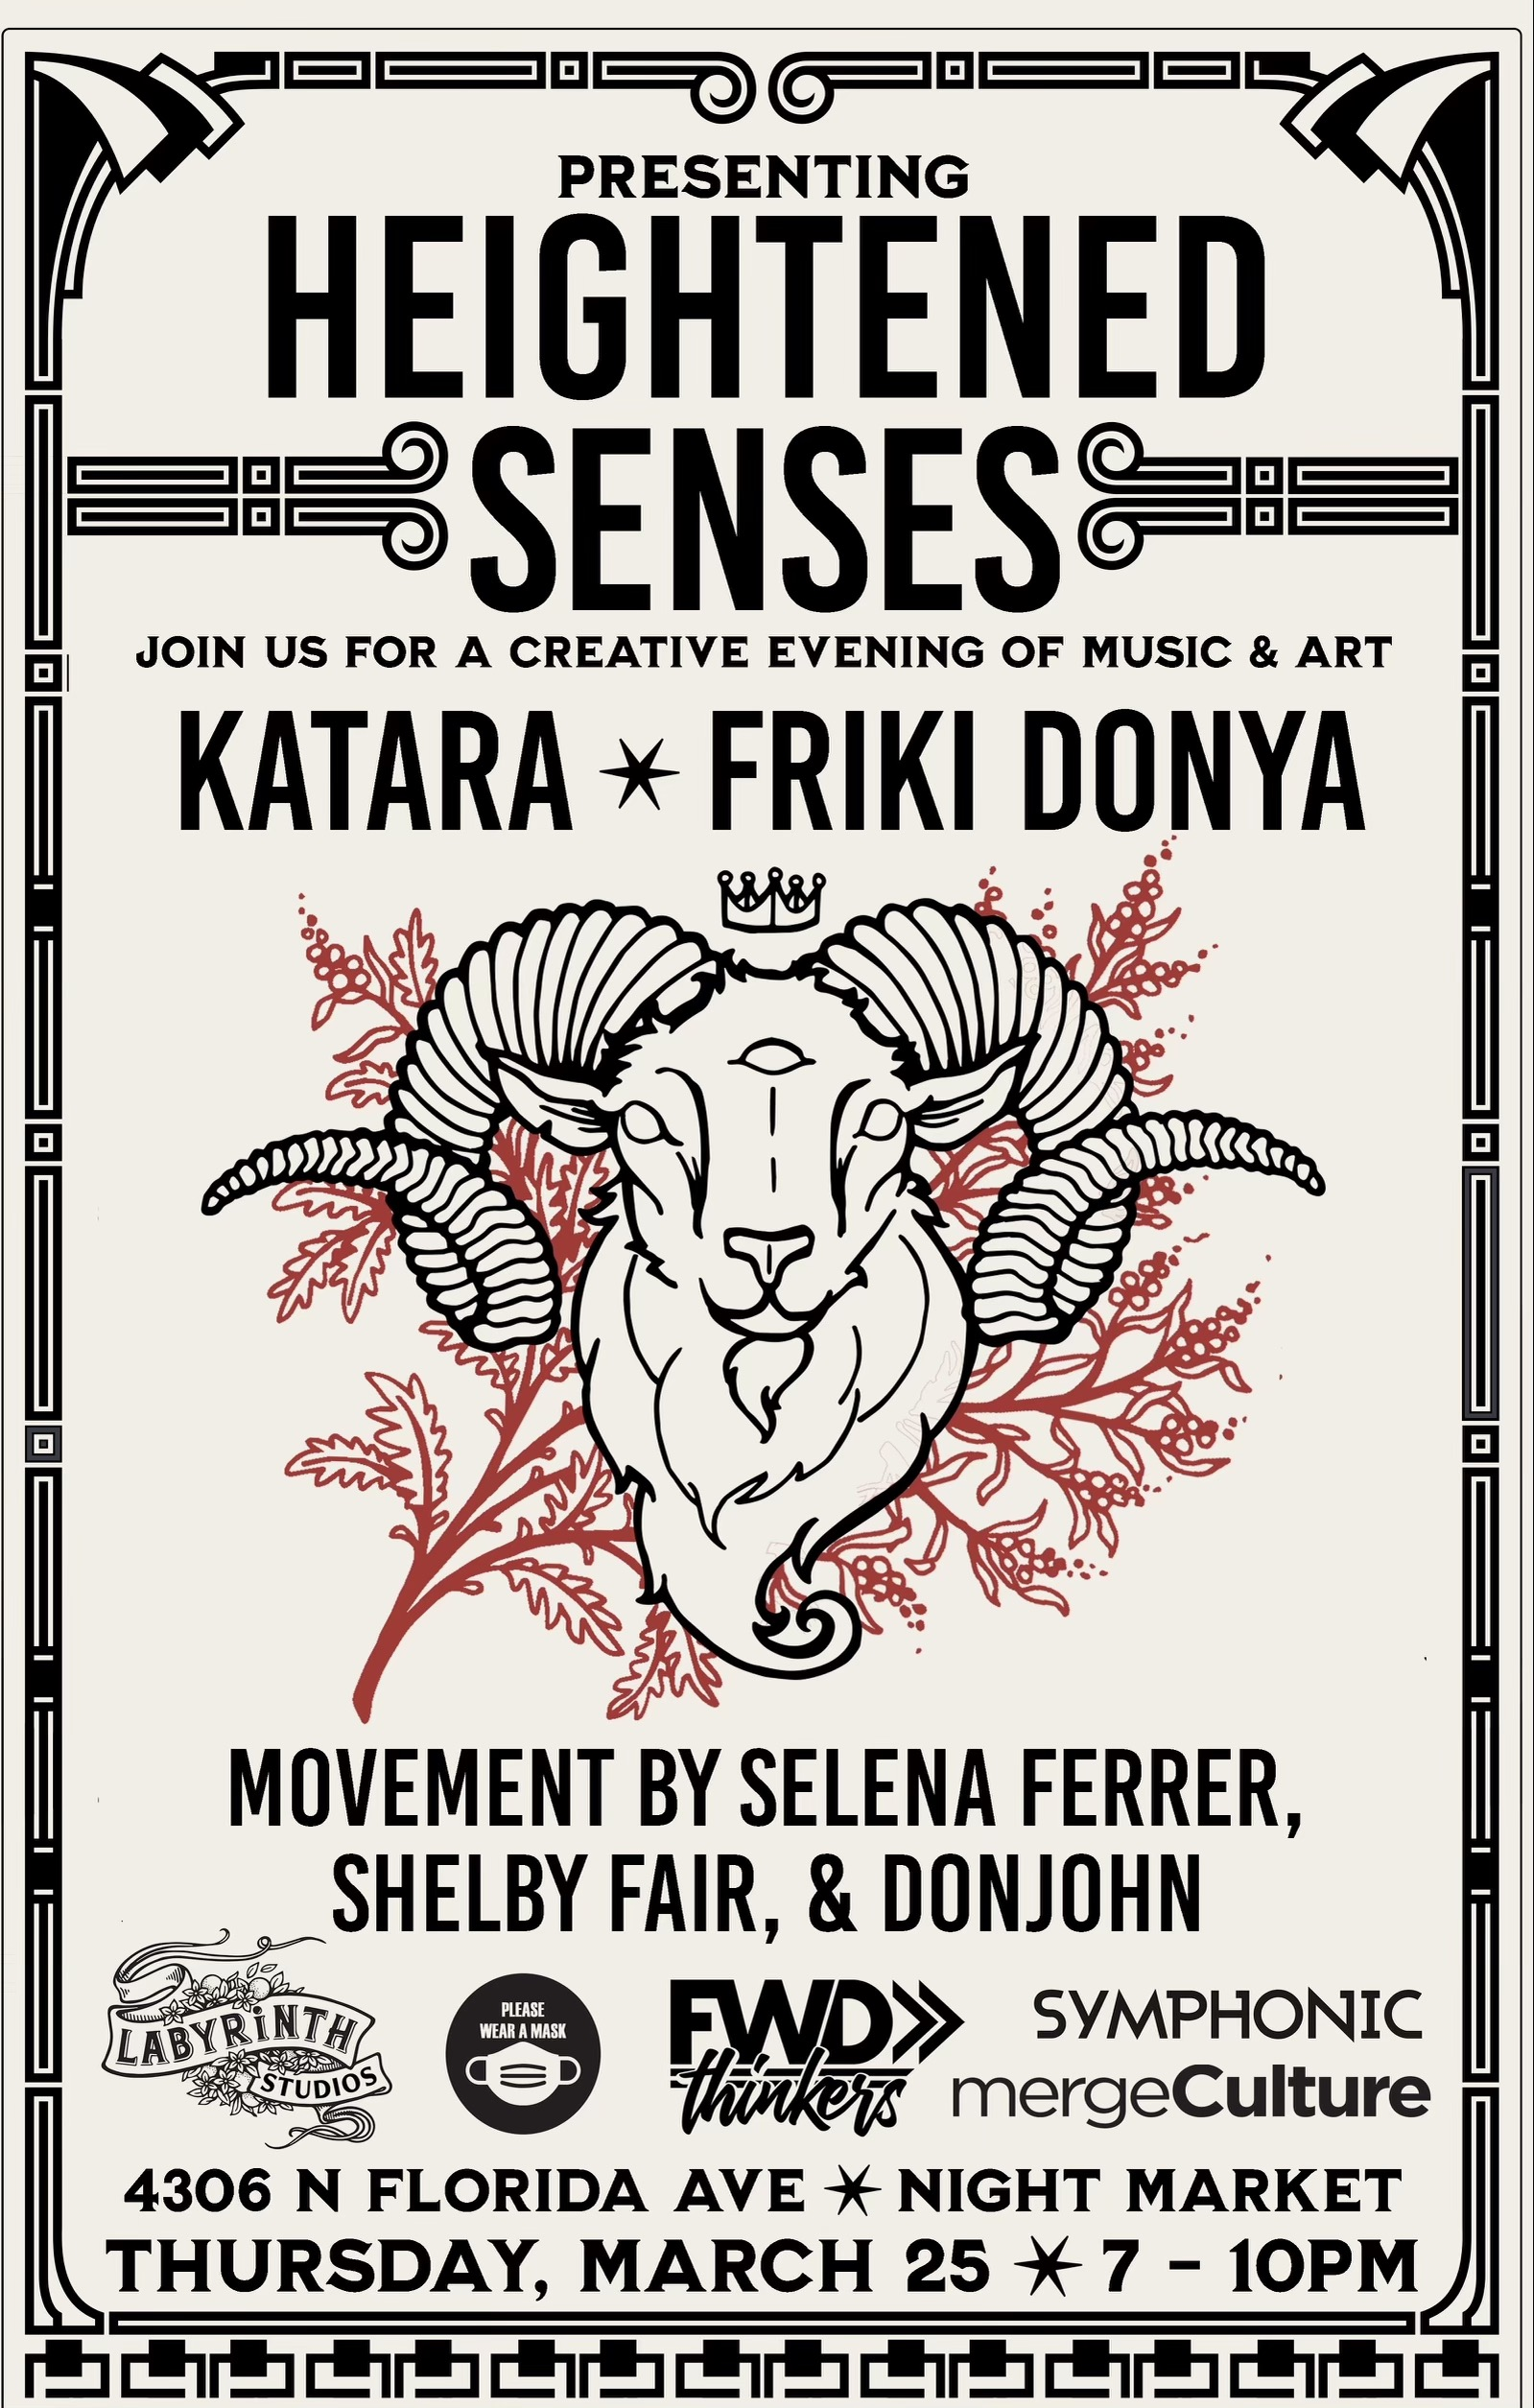 Heightened Senses-Five5-Seminole Heights-Labyrinth-Live-KataraTrio